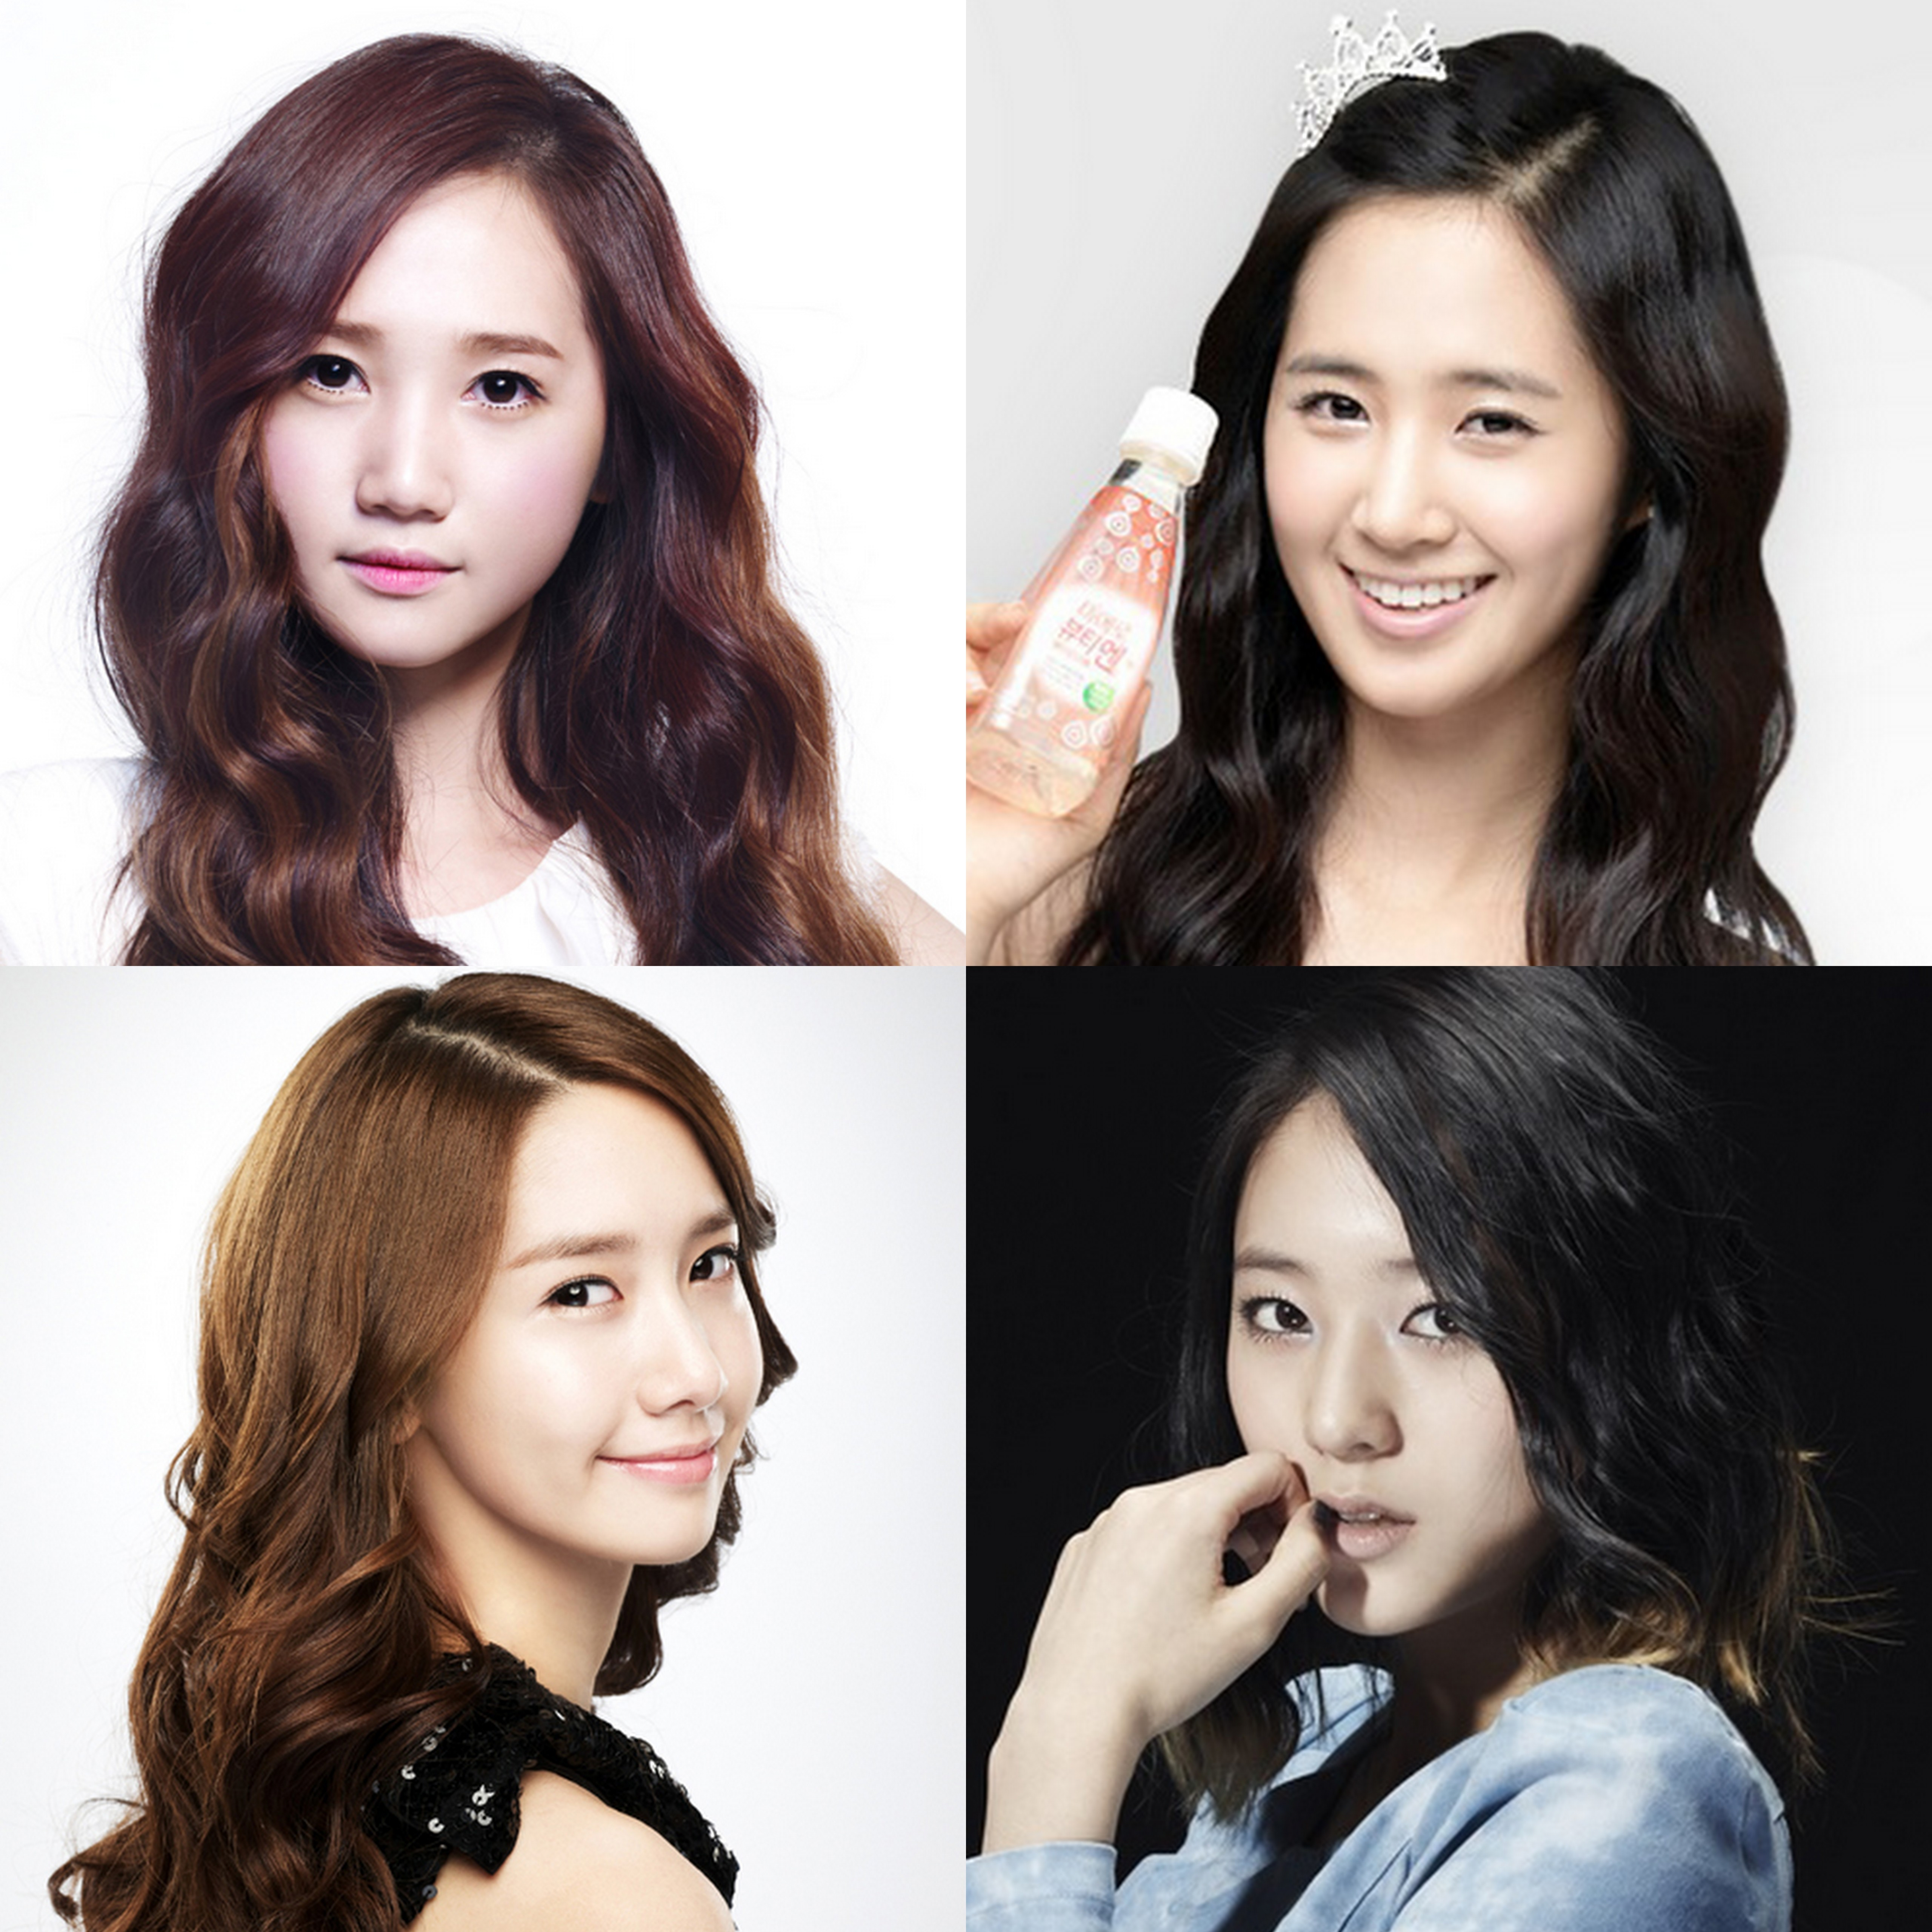 Idols que se parecen ! - Discusión General - Soompi ... Krystal Jung And Yoona Look Alike